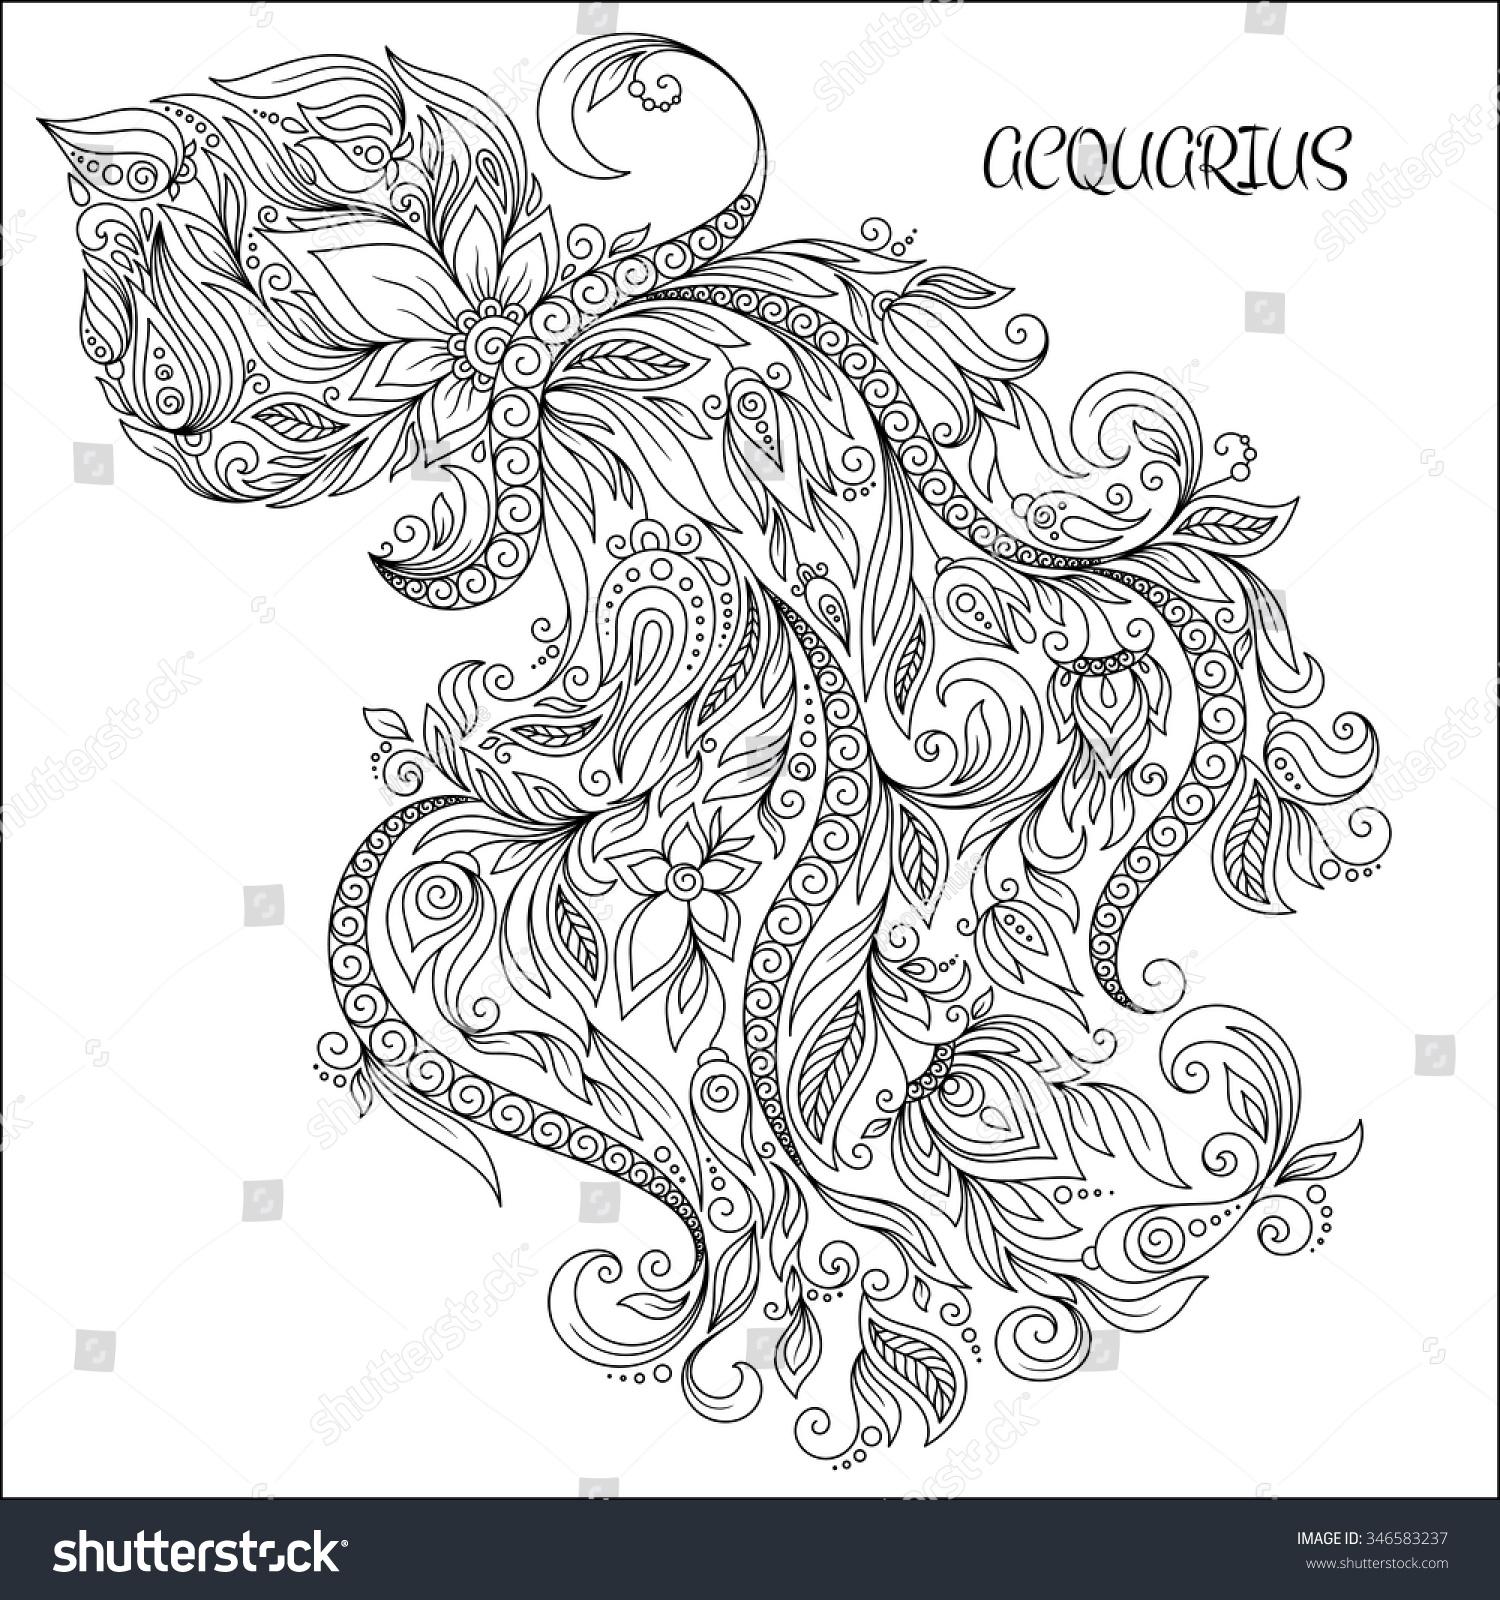 Pattern For Coloring Book Hand Drawn Line Flowers Art Of Zodiac Aquarius Horoscope Symbol